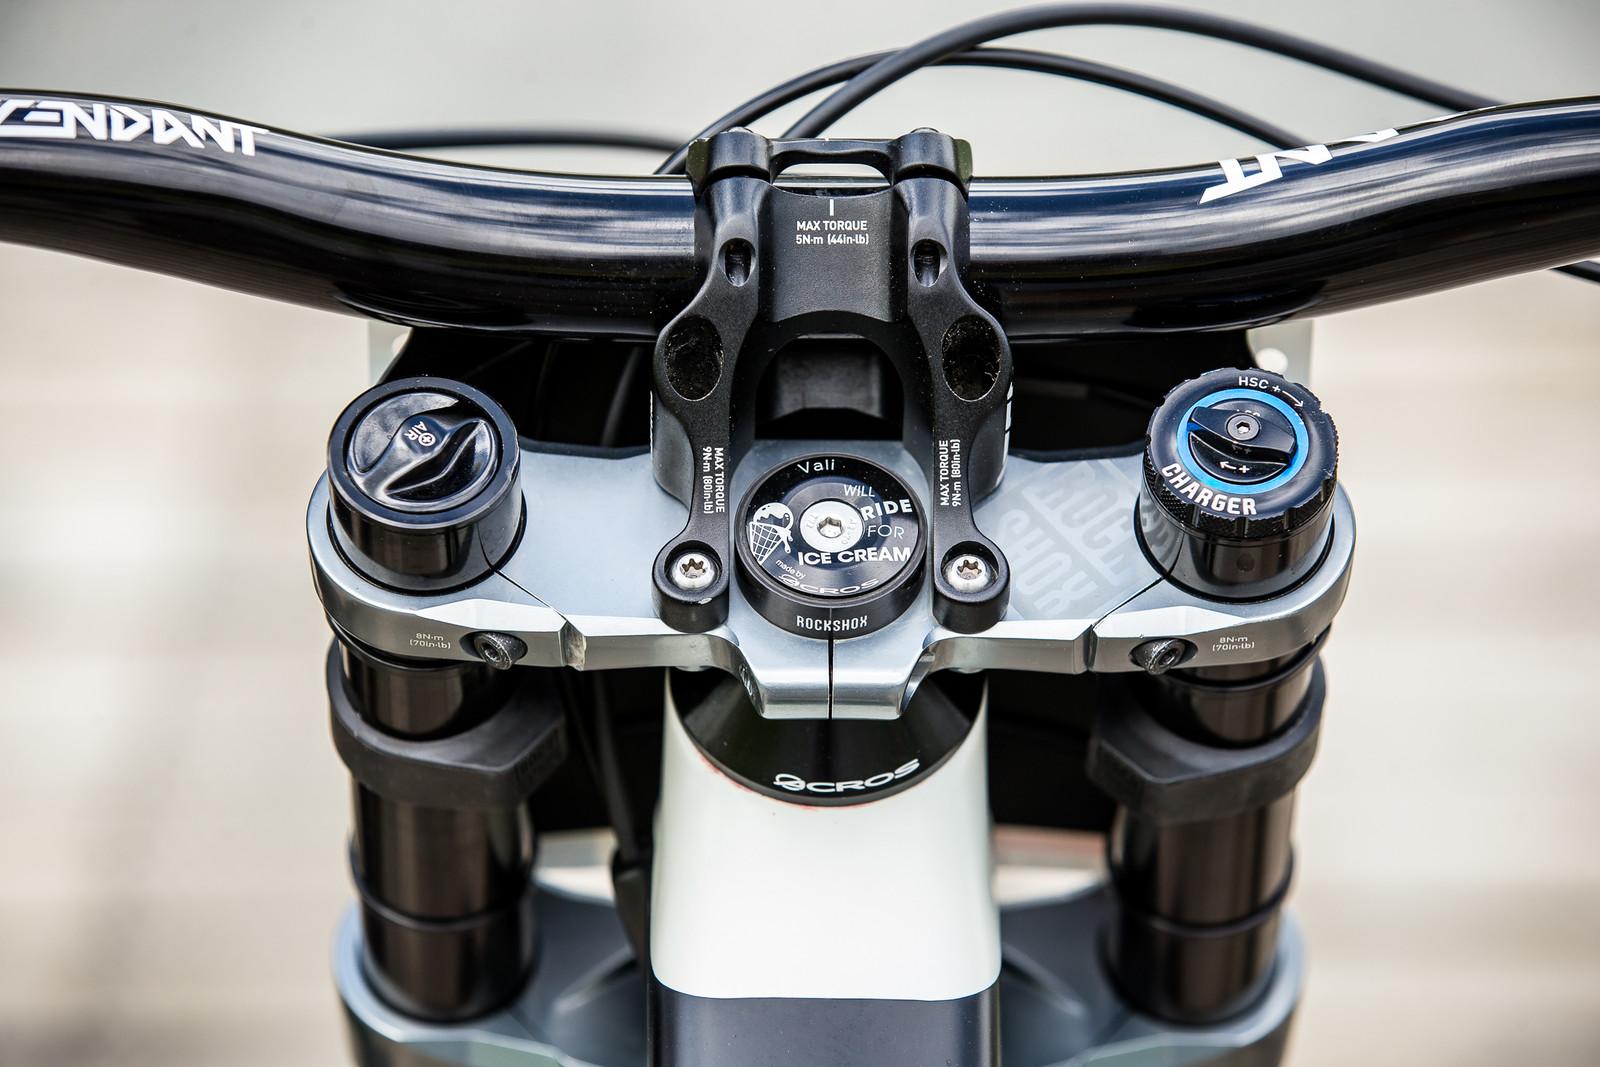 Motivation and Truvativ Descendant Bars and Stem - WINNING BIKE - Vali Höll's YT TUES - Mountain Biking Pictures - Vital MTB